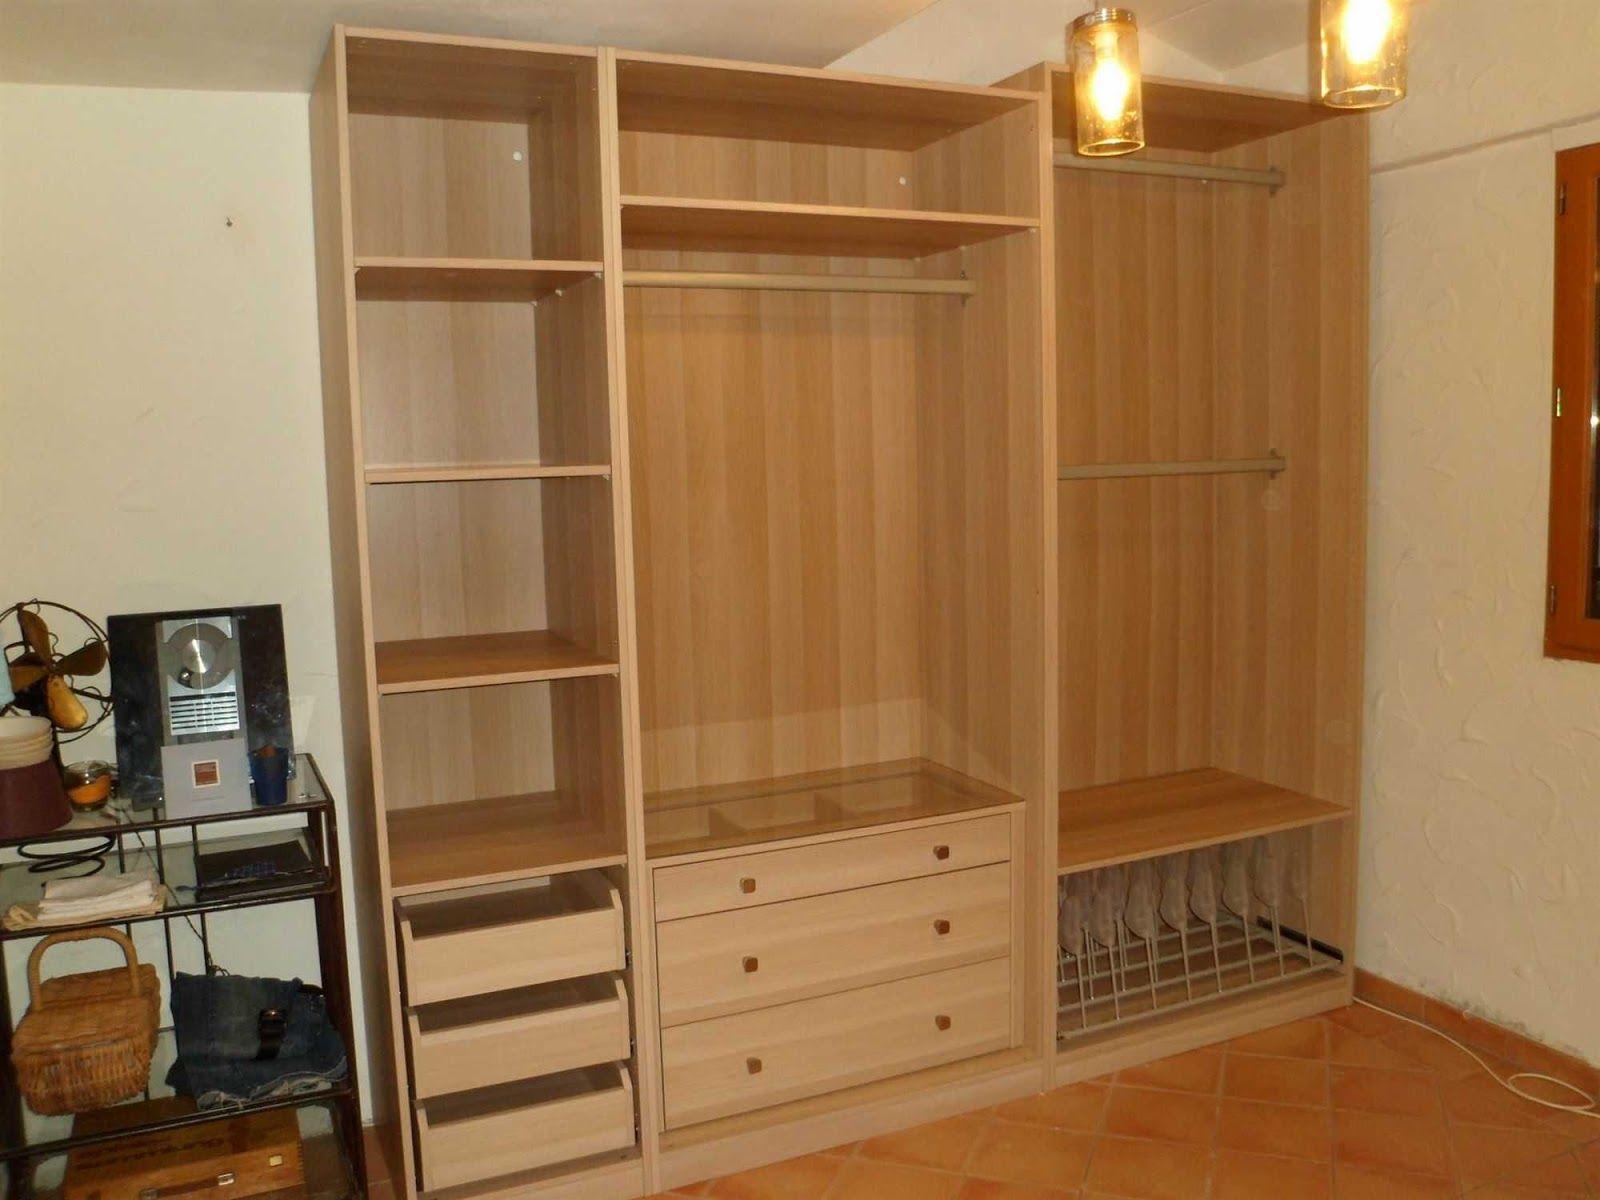 20 Decent Kit Rangement Chambre in 2020 | Tall cabinet storage, Ikea stuva, Home decor